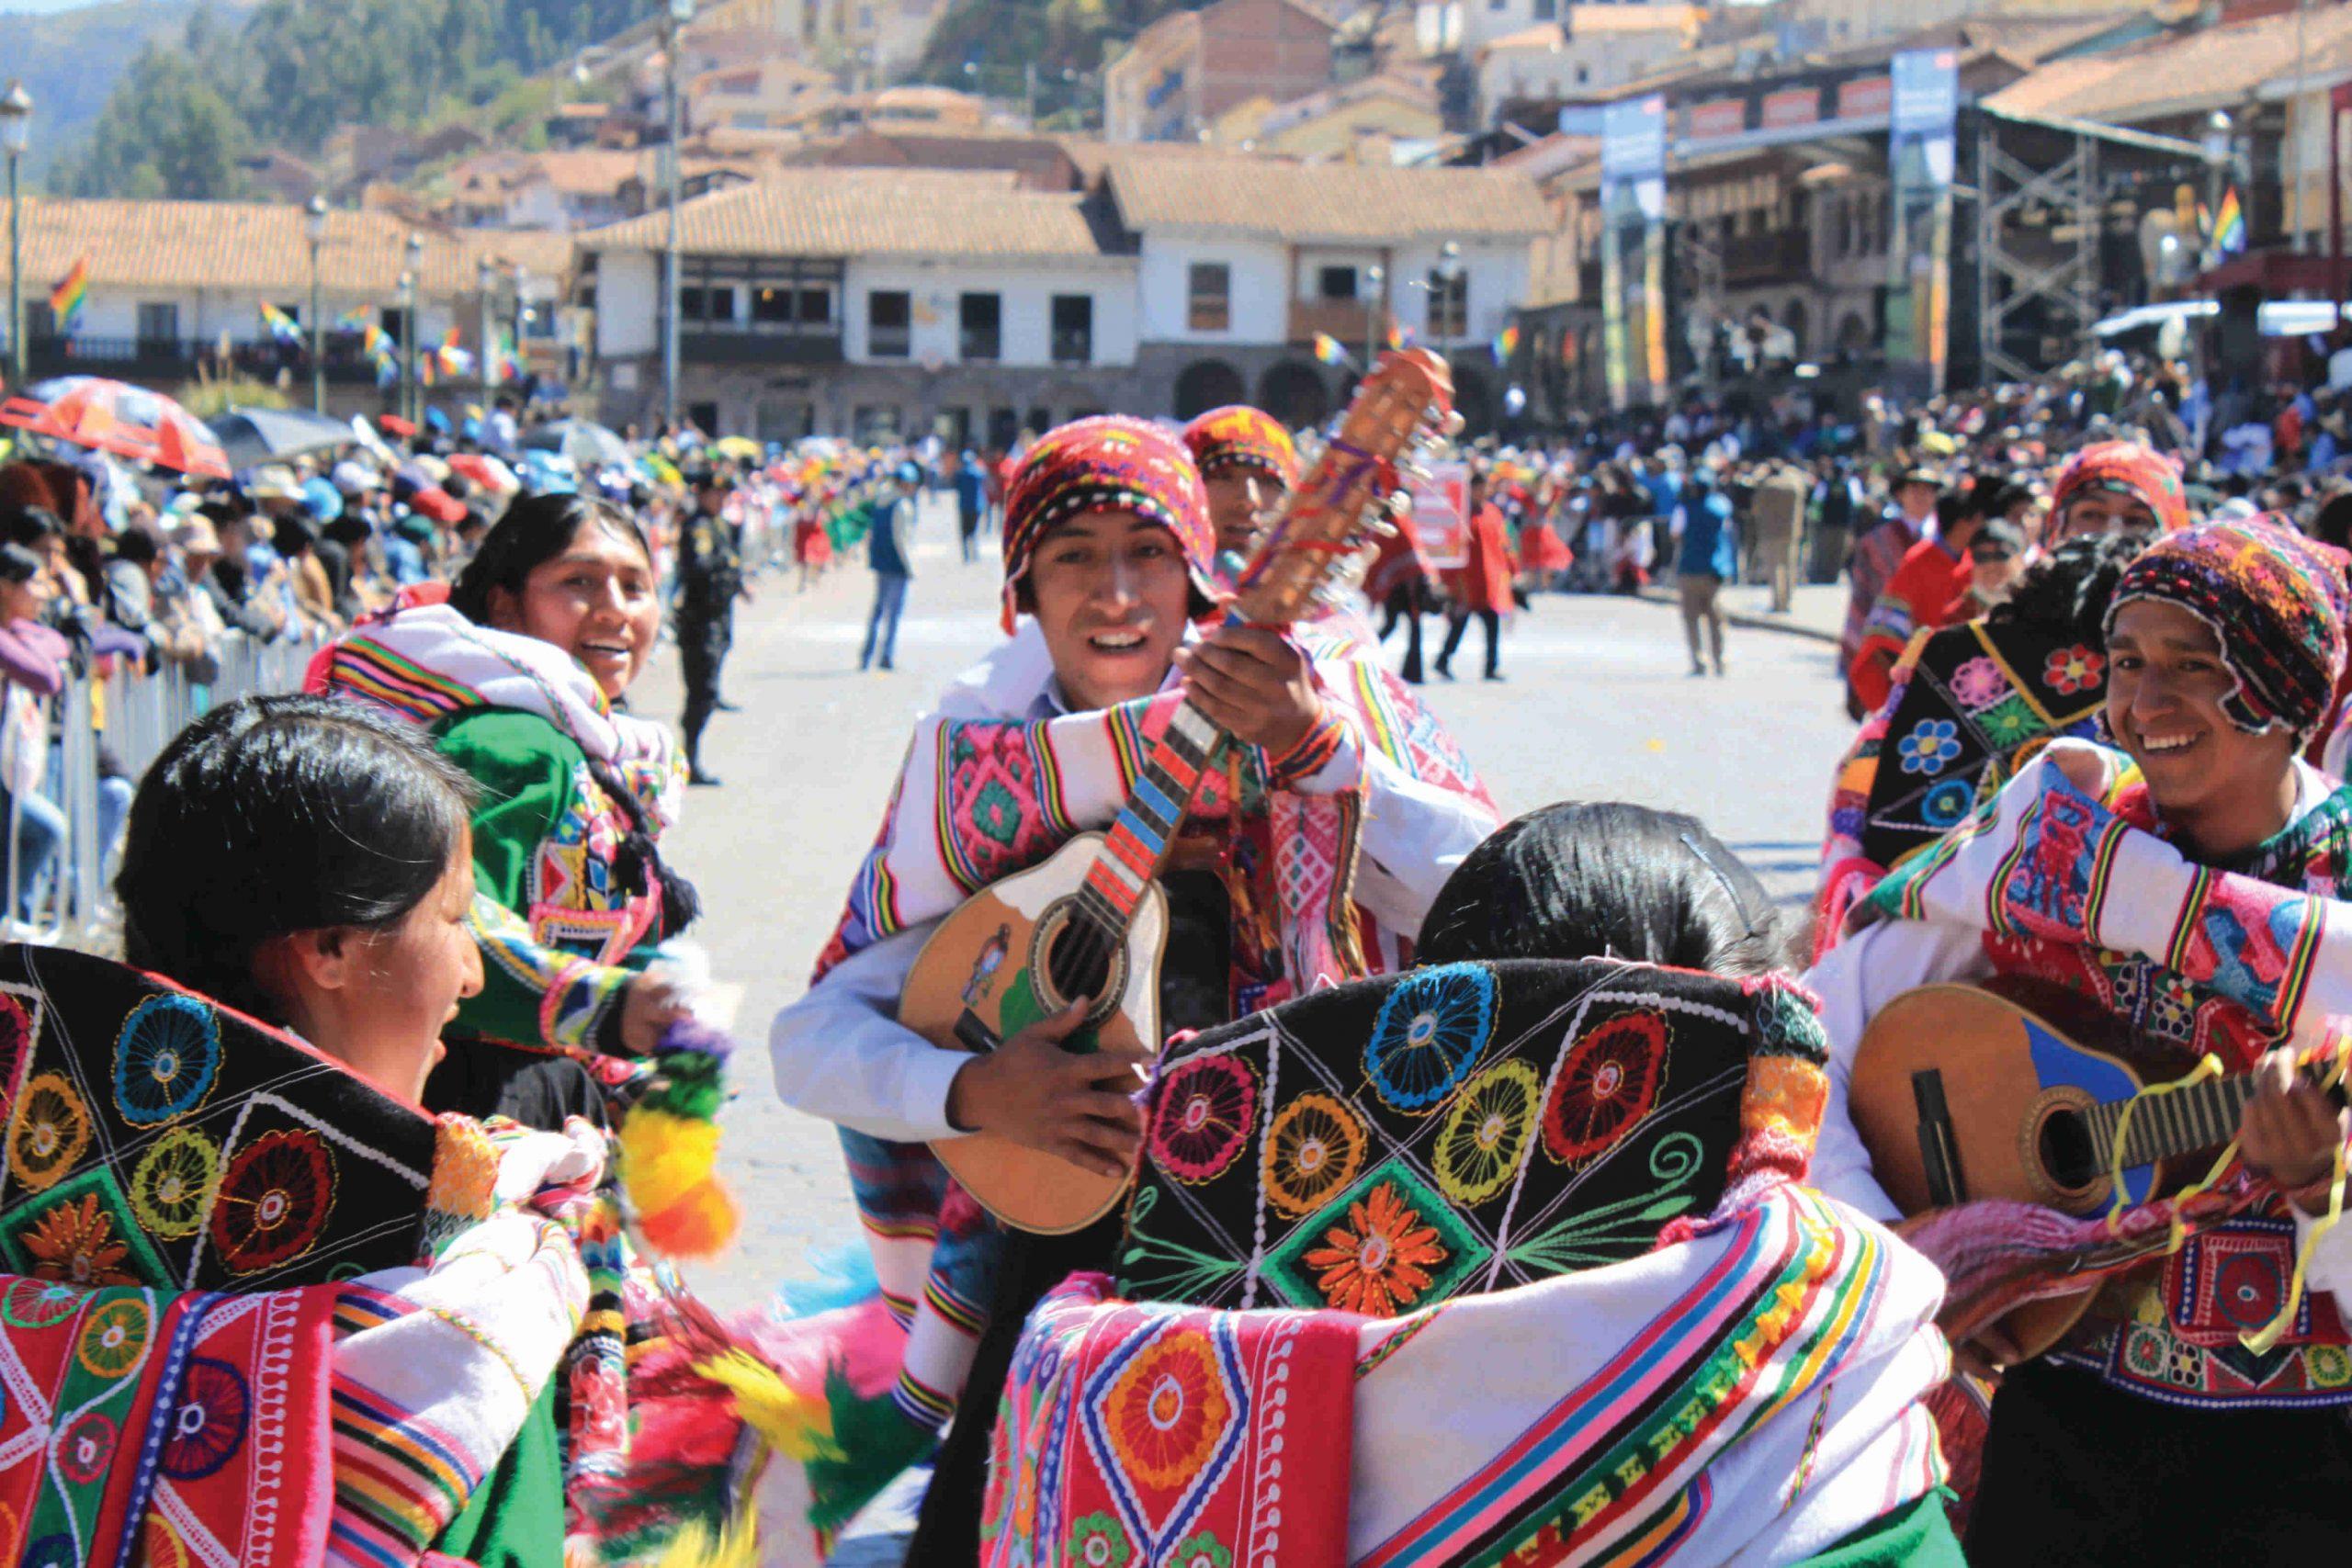 school_expedition_peru_trek_traditional_music-1-1